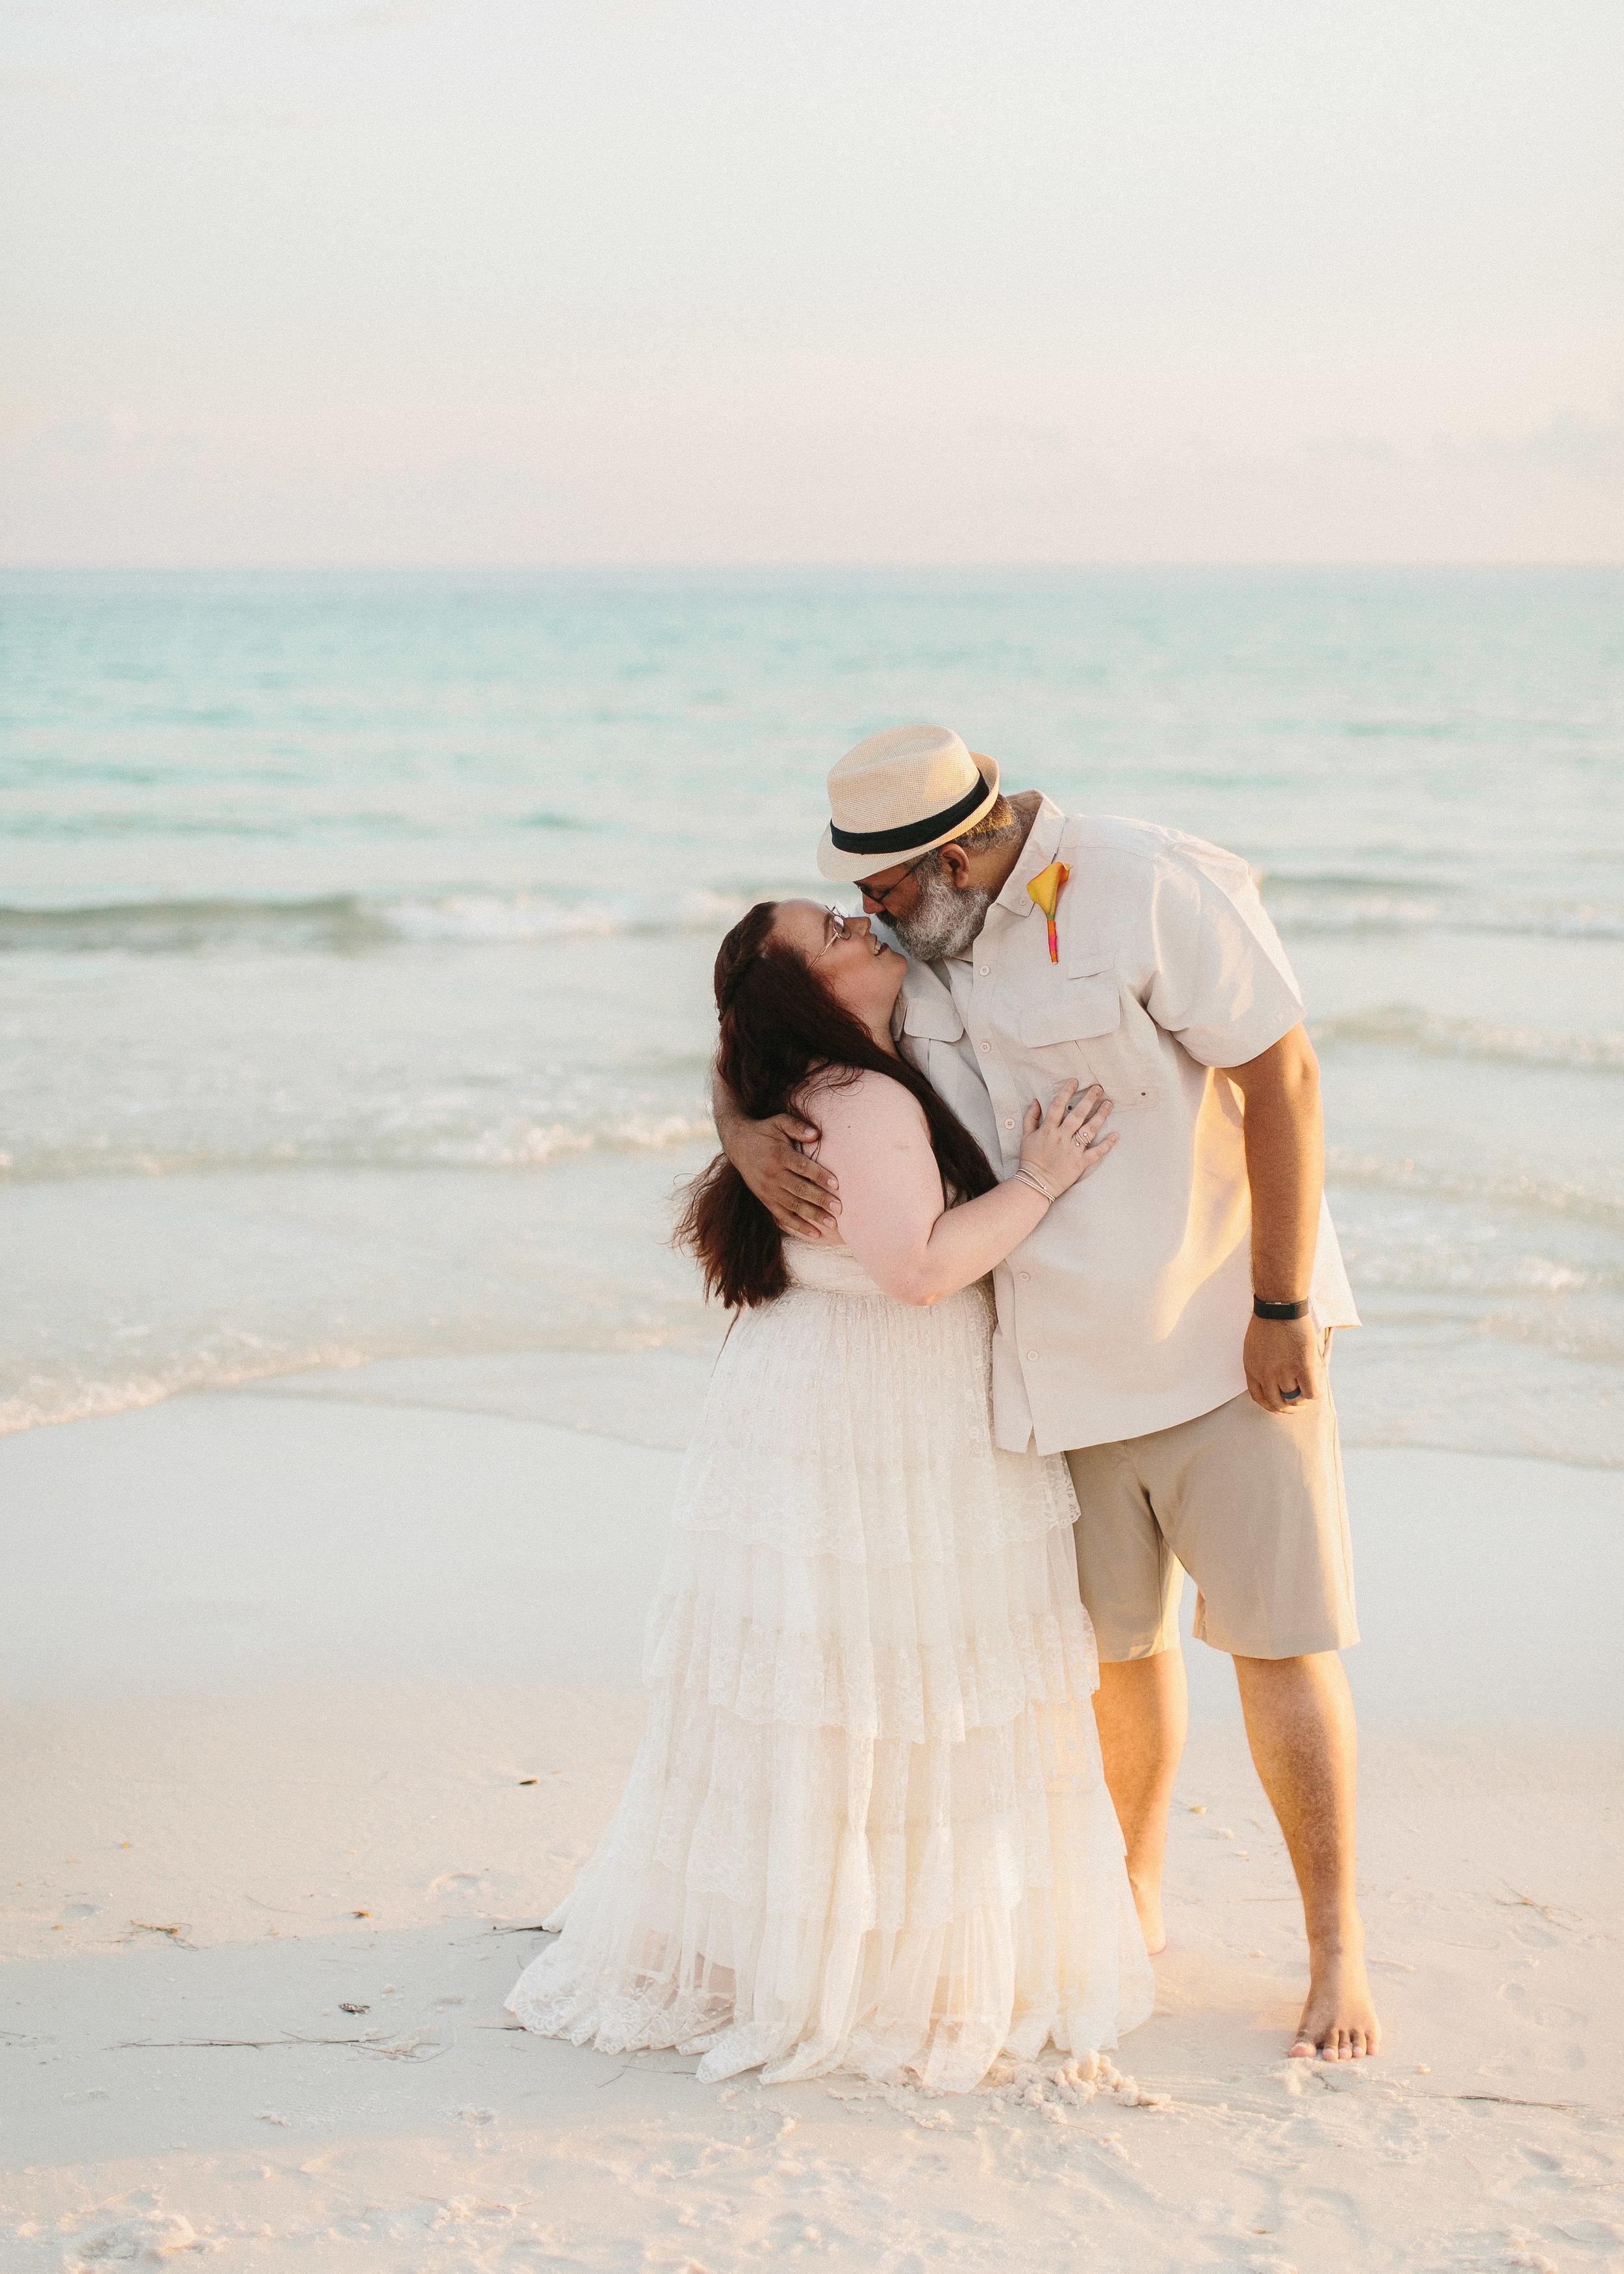 destin_sunset_beach_elopement_intimate_wedding_photographer_florida_documentary_1266.jpg